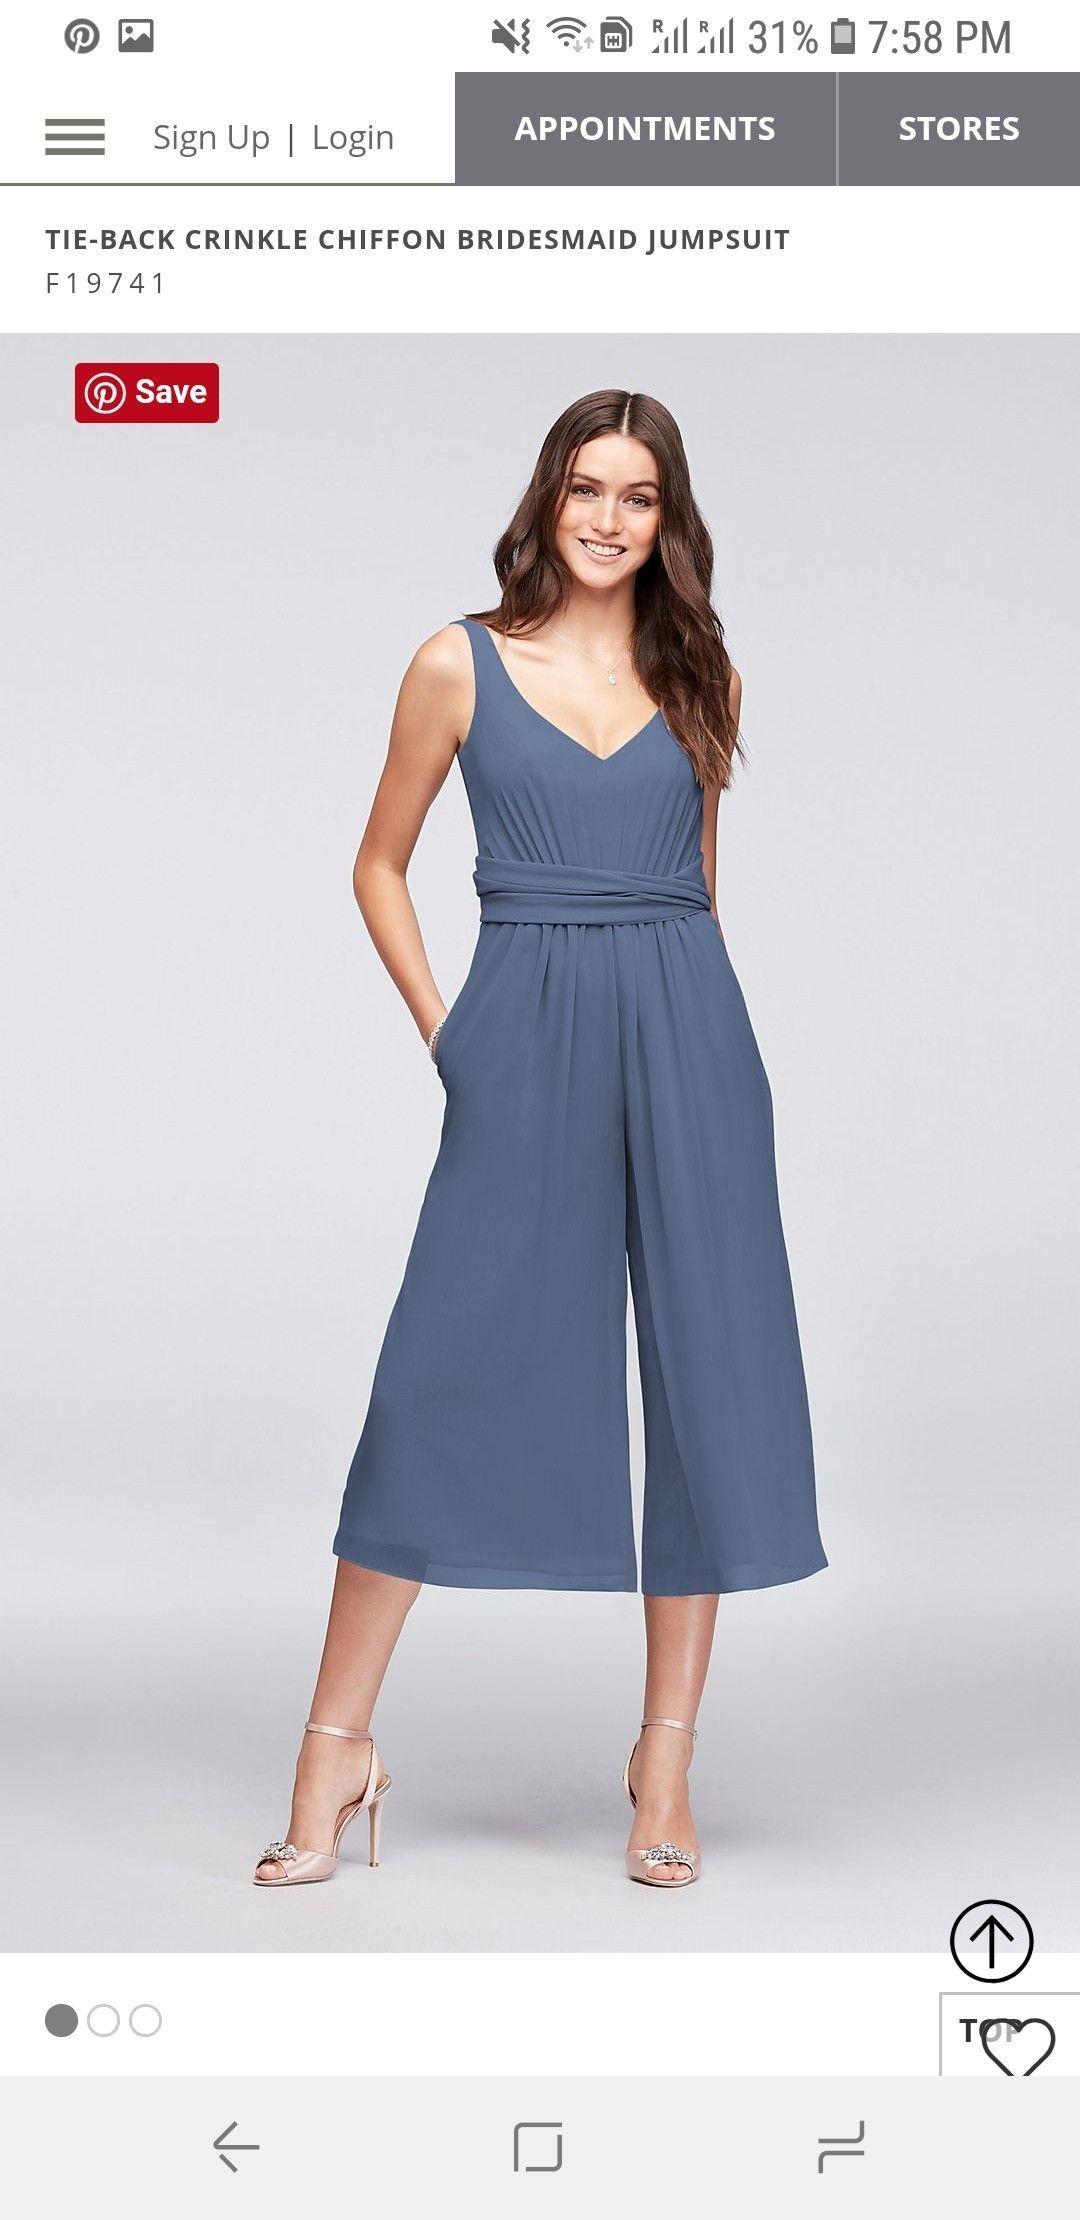 $49.99 - STEEL BLUE - Tie-Back Crinkle Chiffon Bridesmaid Jumpsuit #bridesmaidjumpsuits $49.99 - STEEL BLUE - Tie-Back Crinkle Chiffon Bridesmaid Jumpsuit #bridesmaidjumpsuits